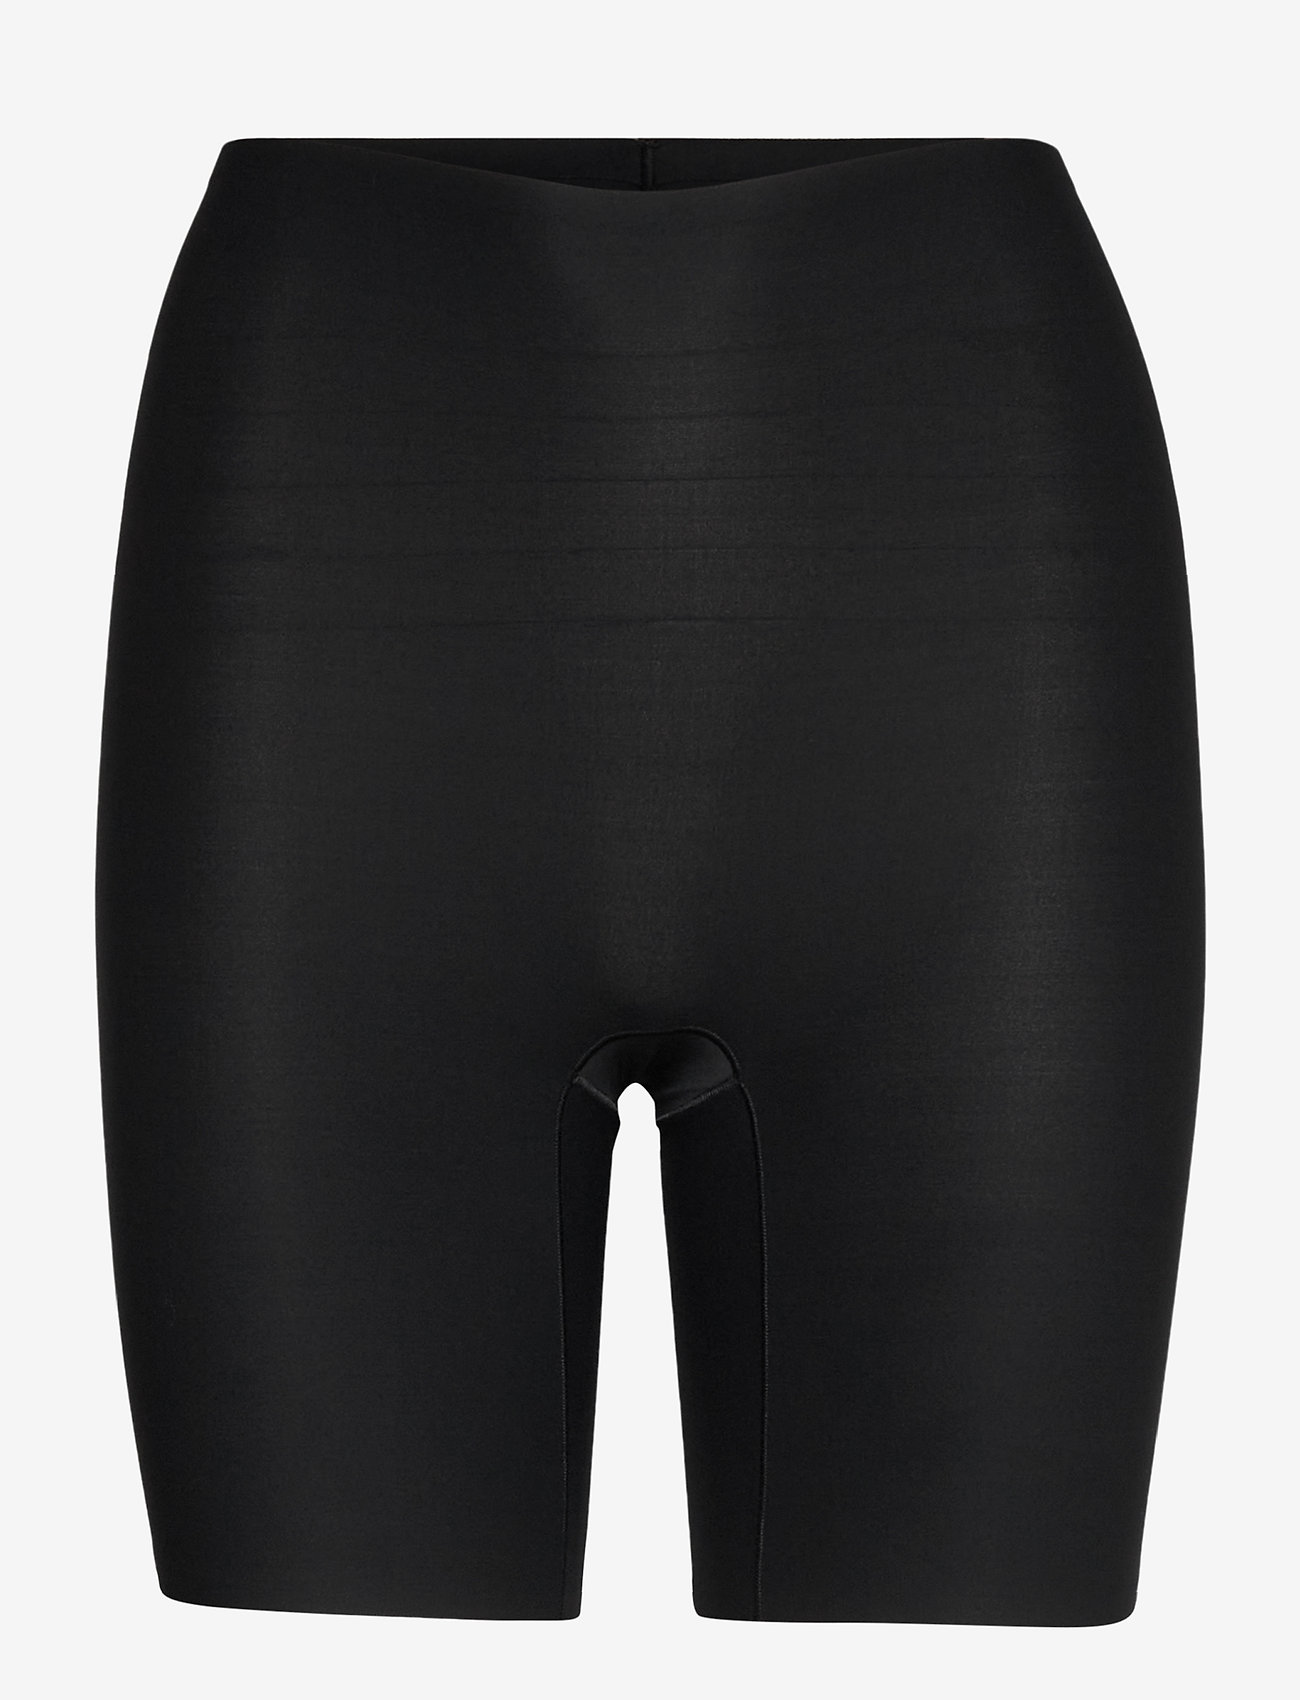 CHANTELLE - Soft Stretch High Waist Mid-Thigh Short - bottoms - black - 1